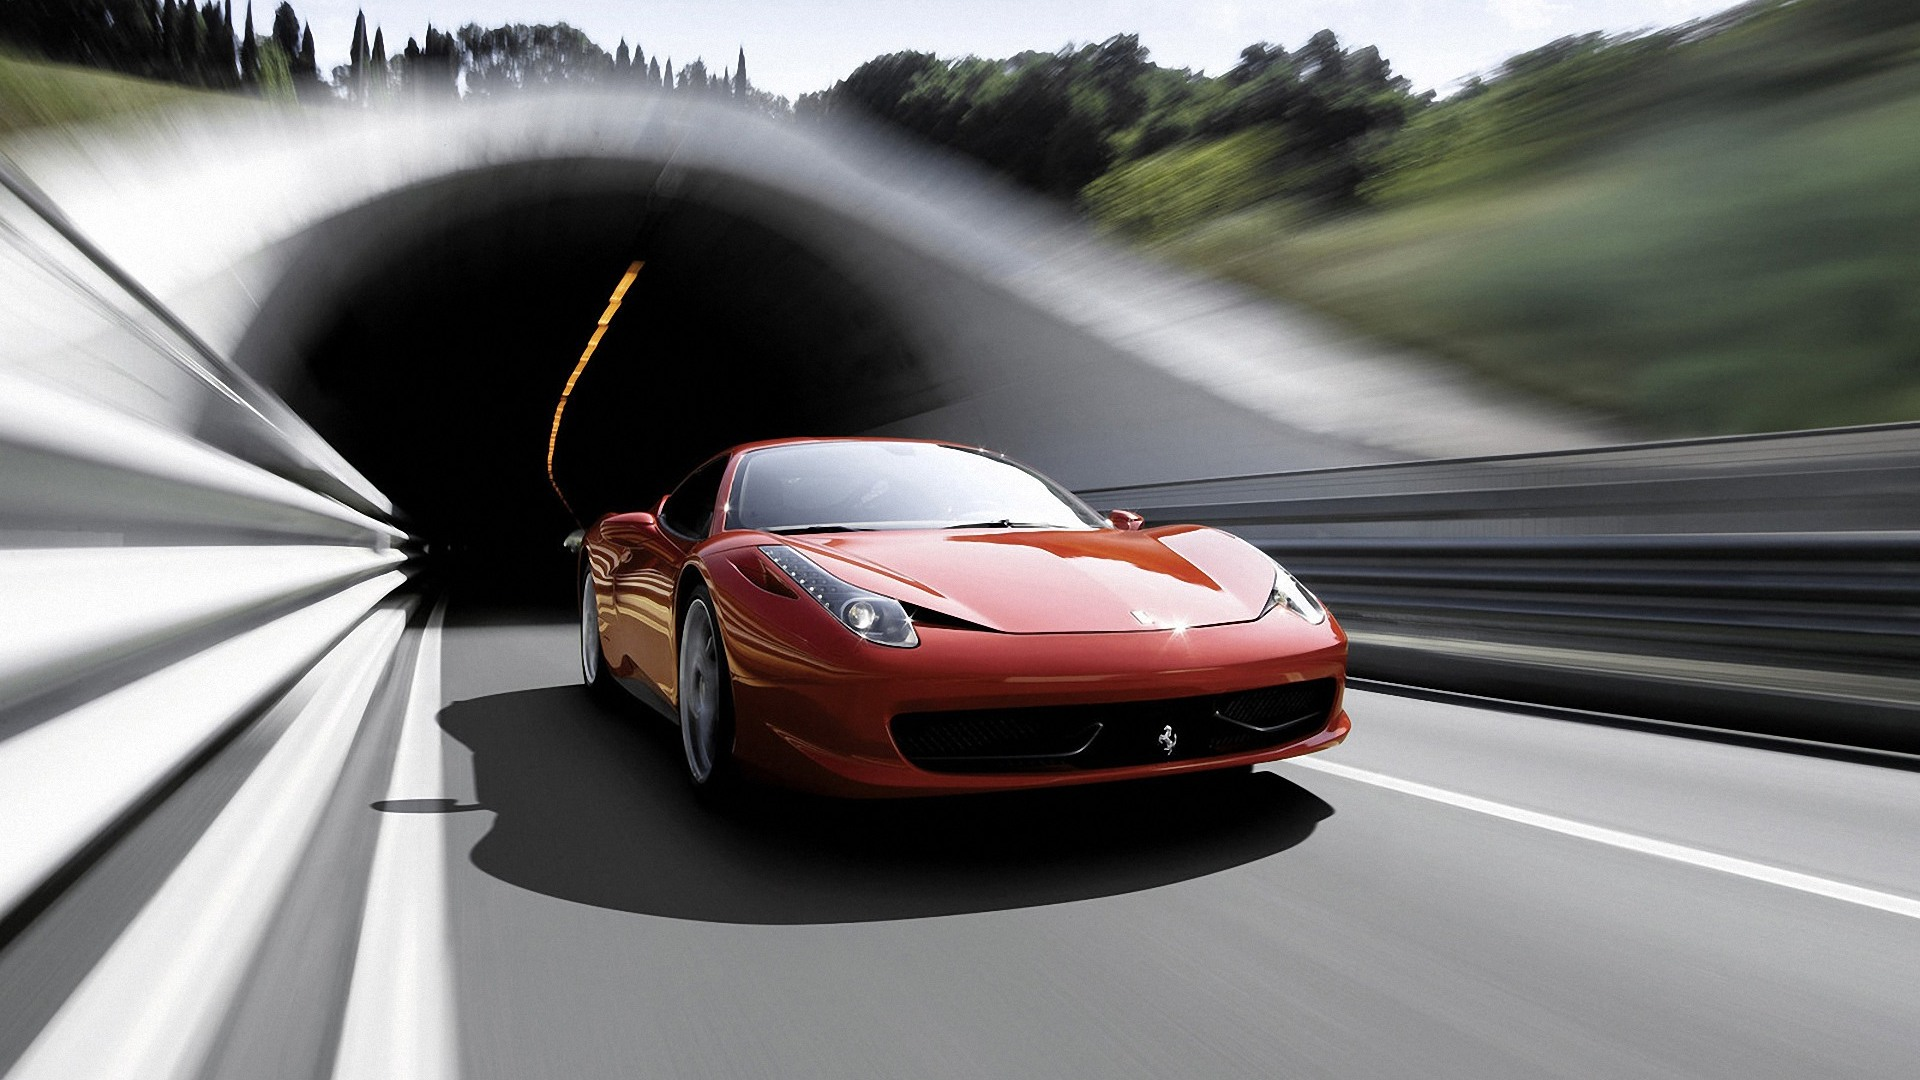 Ferrari 458 Italia wallpaper 1920x1080 WallpapersFerrari 458 Italia 1920x1080